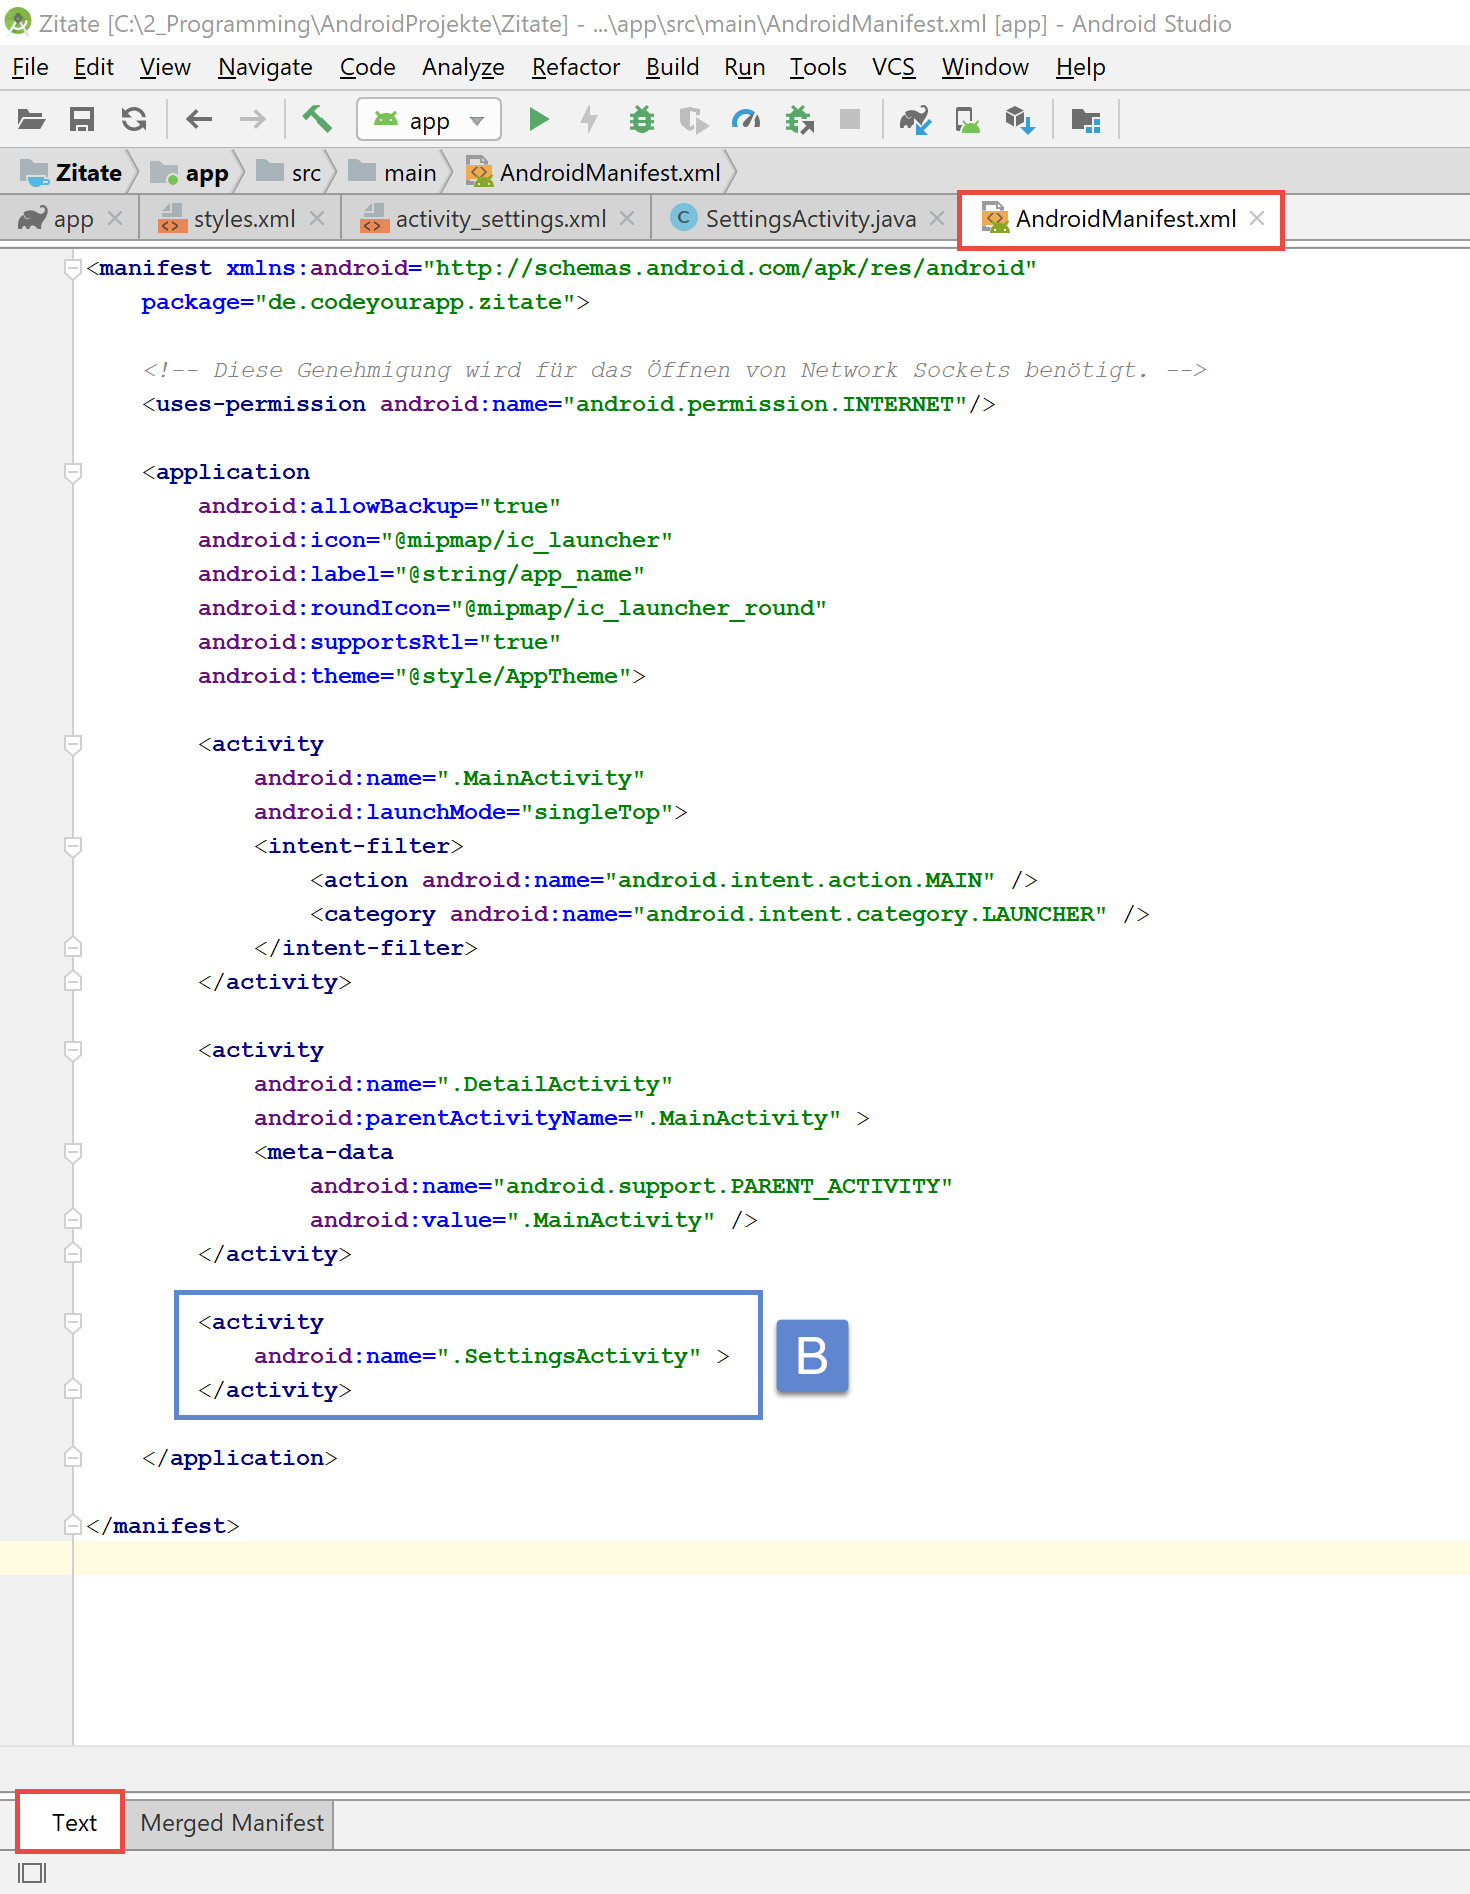 android_manifest_settingsactivity